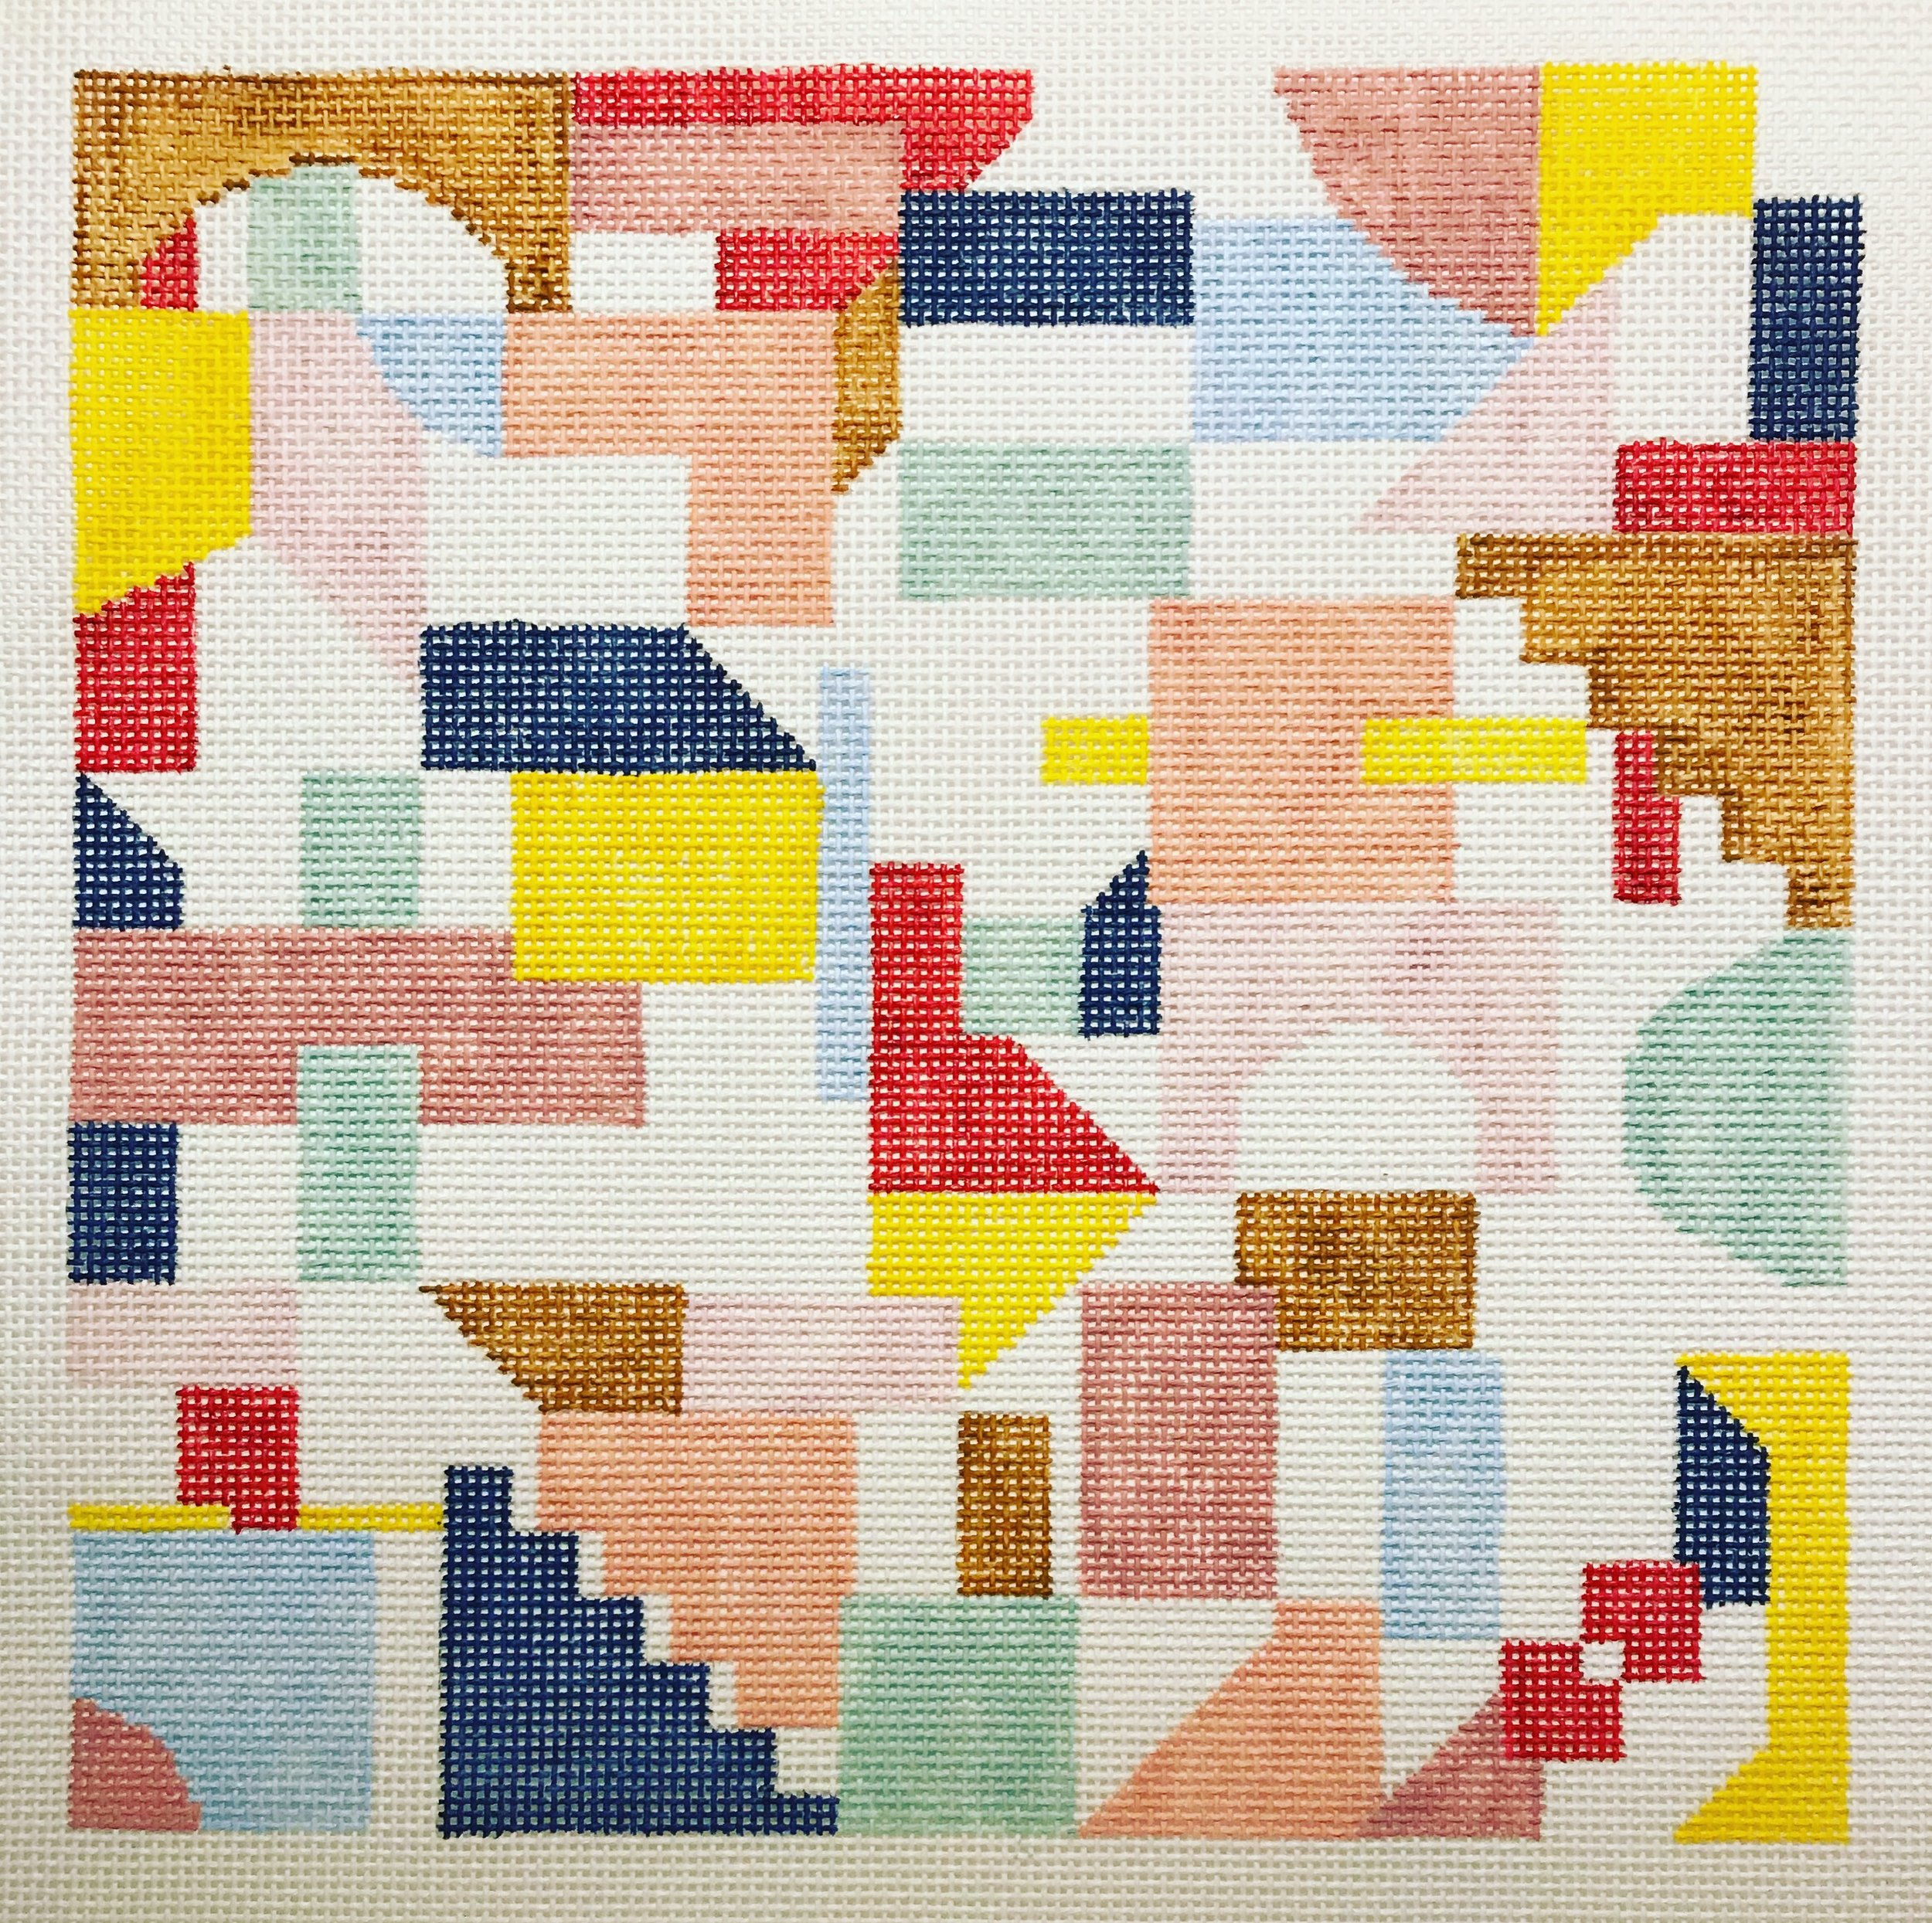 "Color Blocks 15KK-4   10"" x 10"" on 13 mesh"